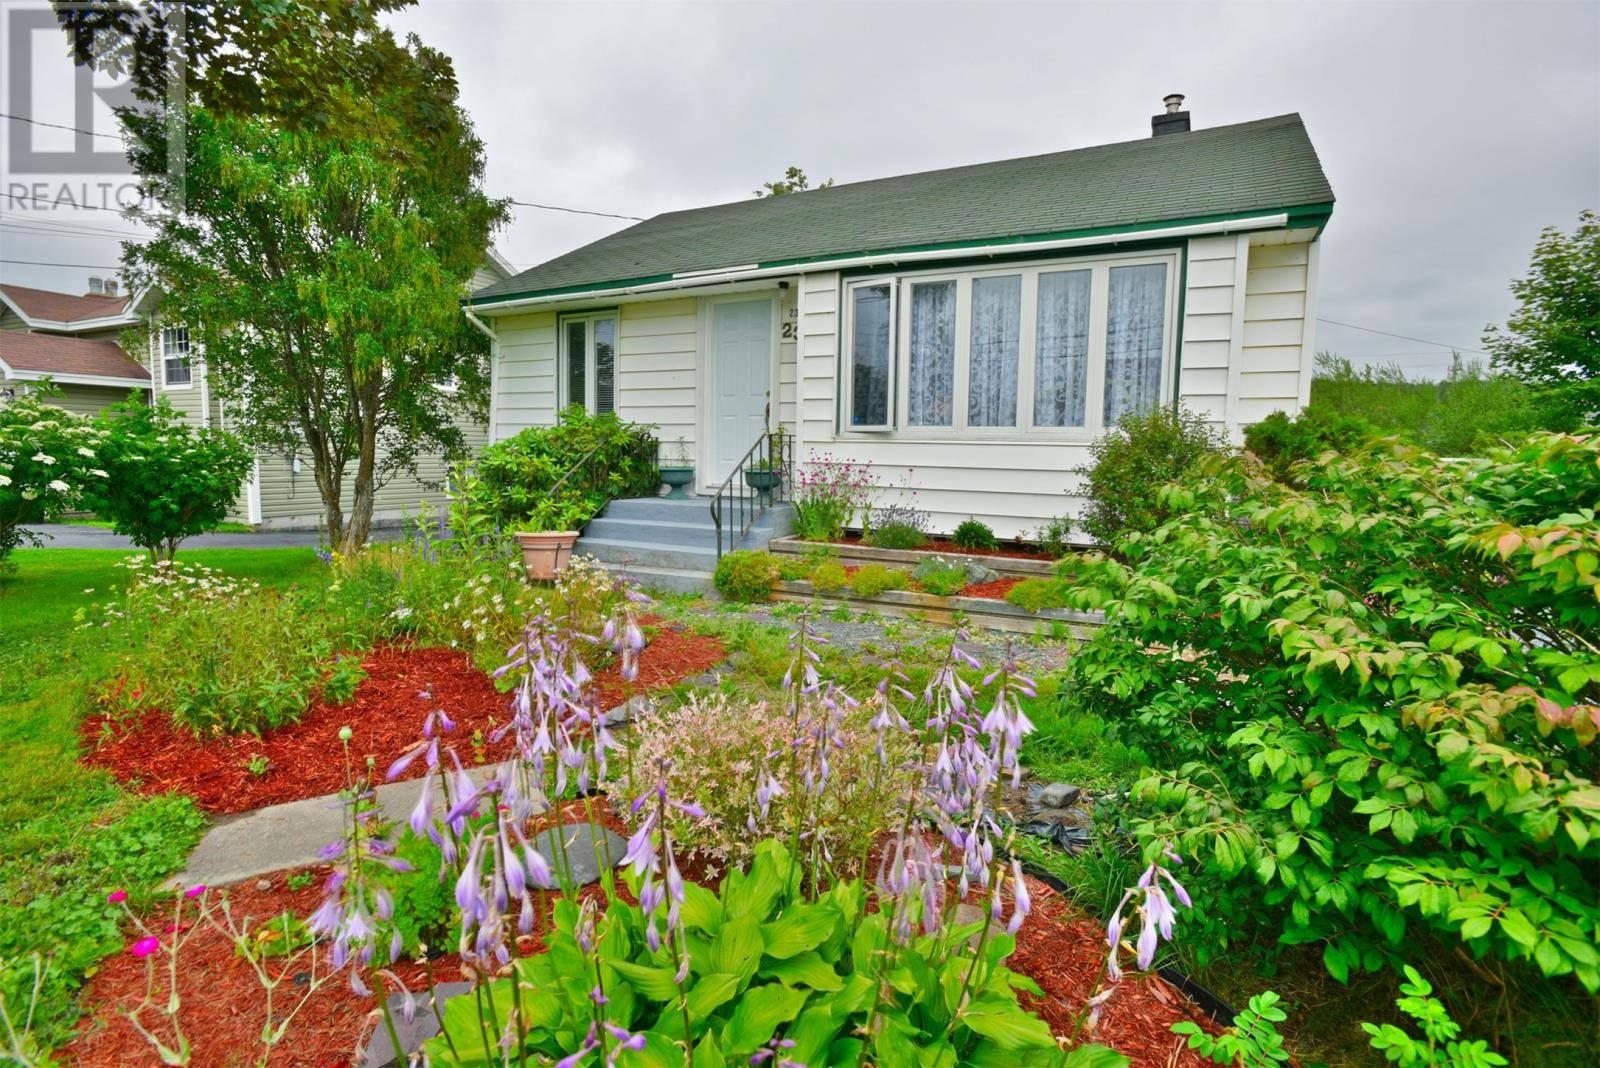 House for sale at 239 Bay Bulls Rd St. John's Newfoundland - MLS: 1201150